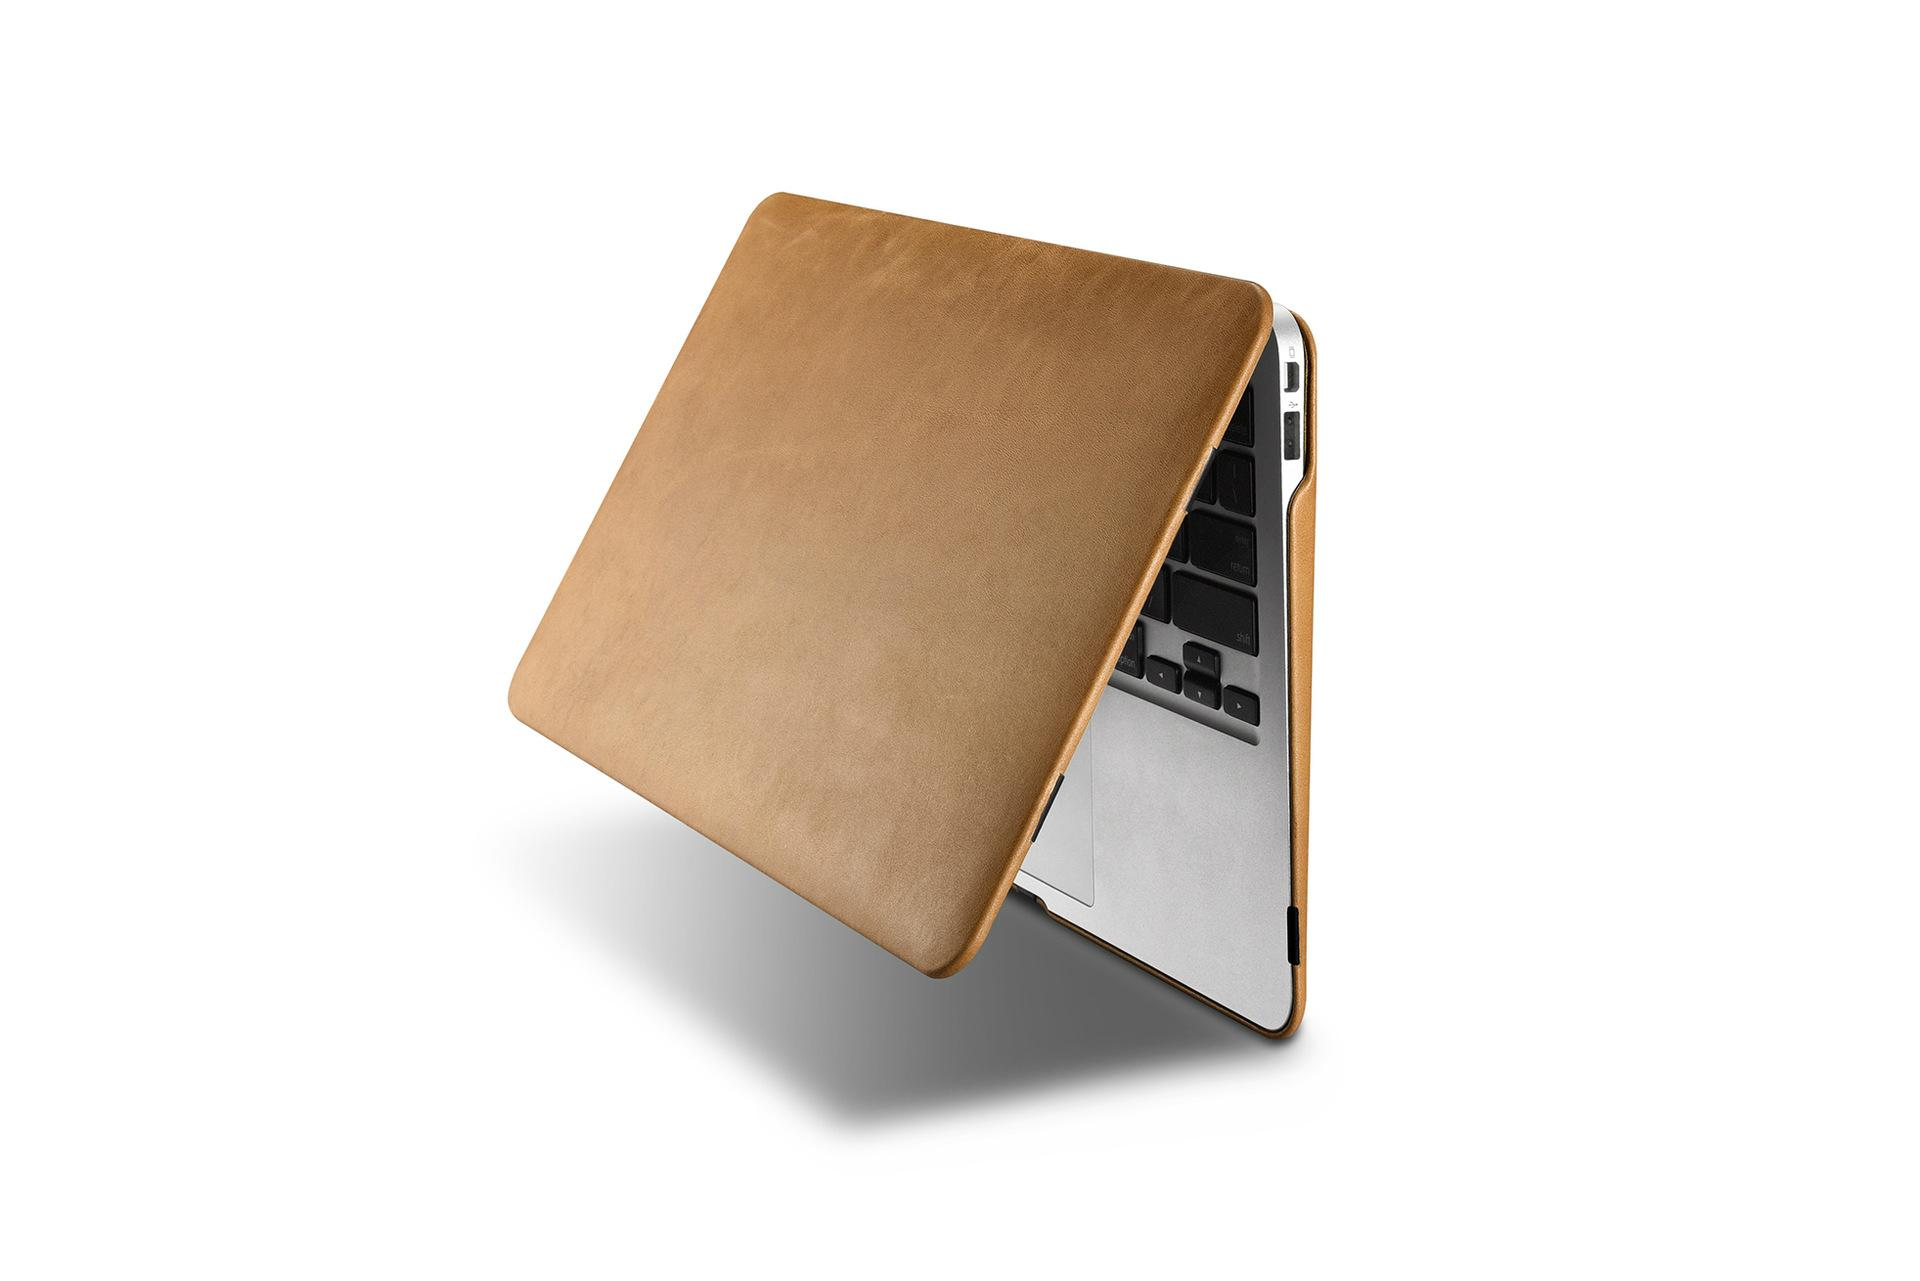 iCarer MacBook Air 11 inch Vintage Book Style Slim Folio Case 10